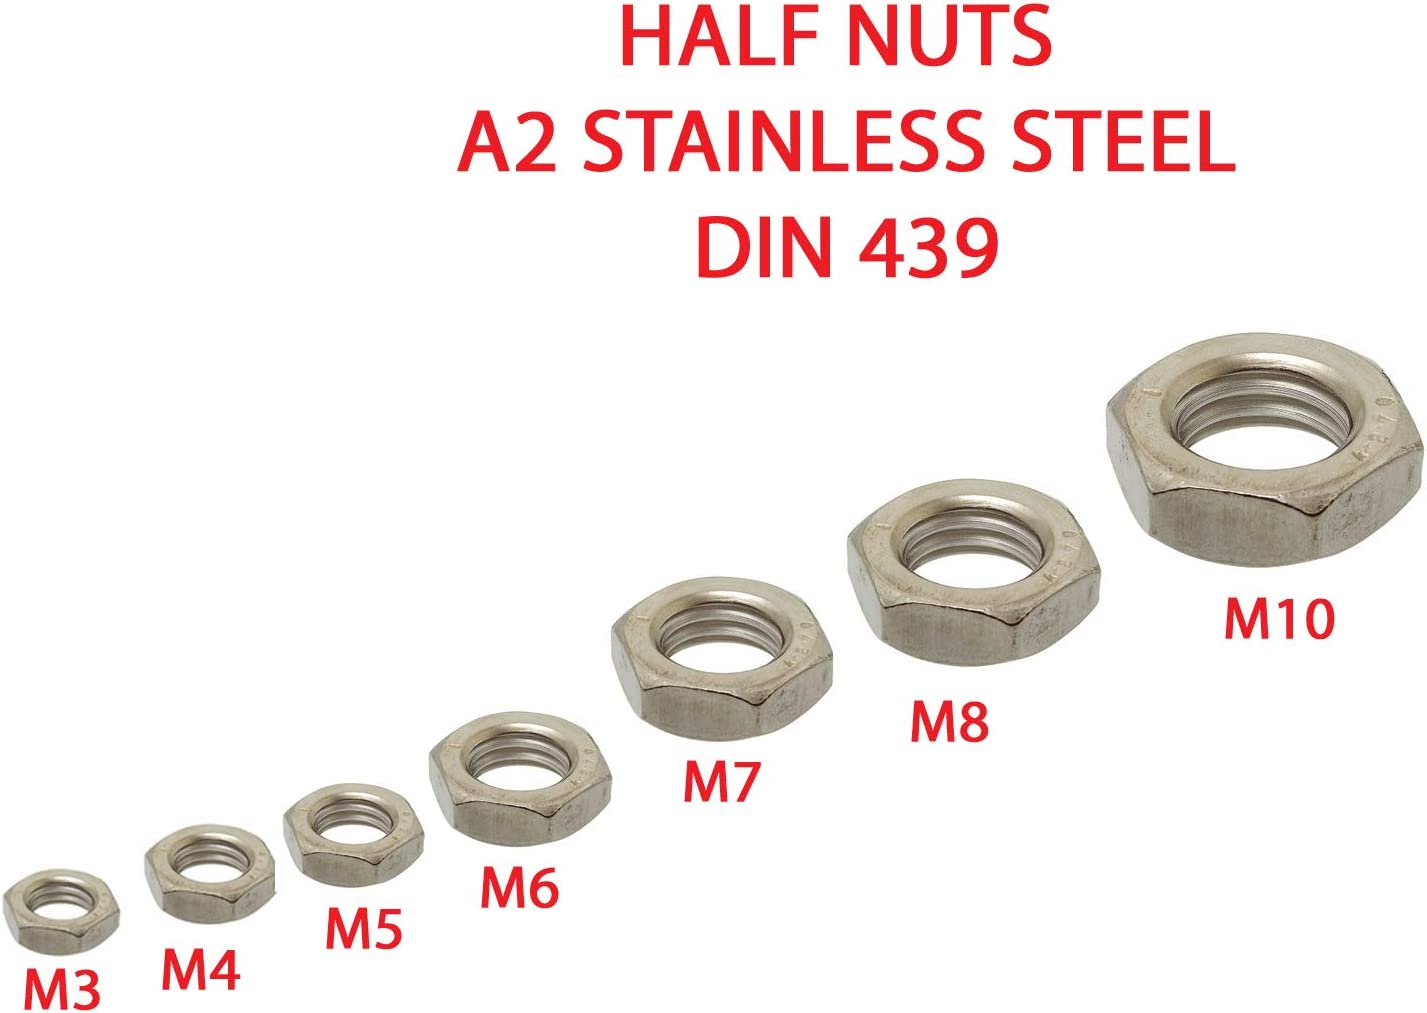 M10 x 1.5 HSS Hexagon Die Nut Metric Course Threading//Hex Shank Hexagonal M10 x 1.5 10mm